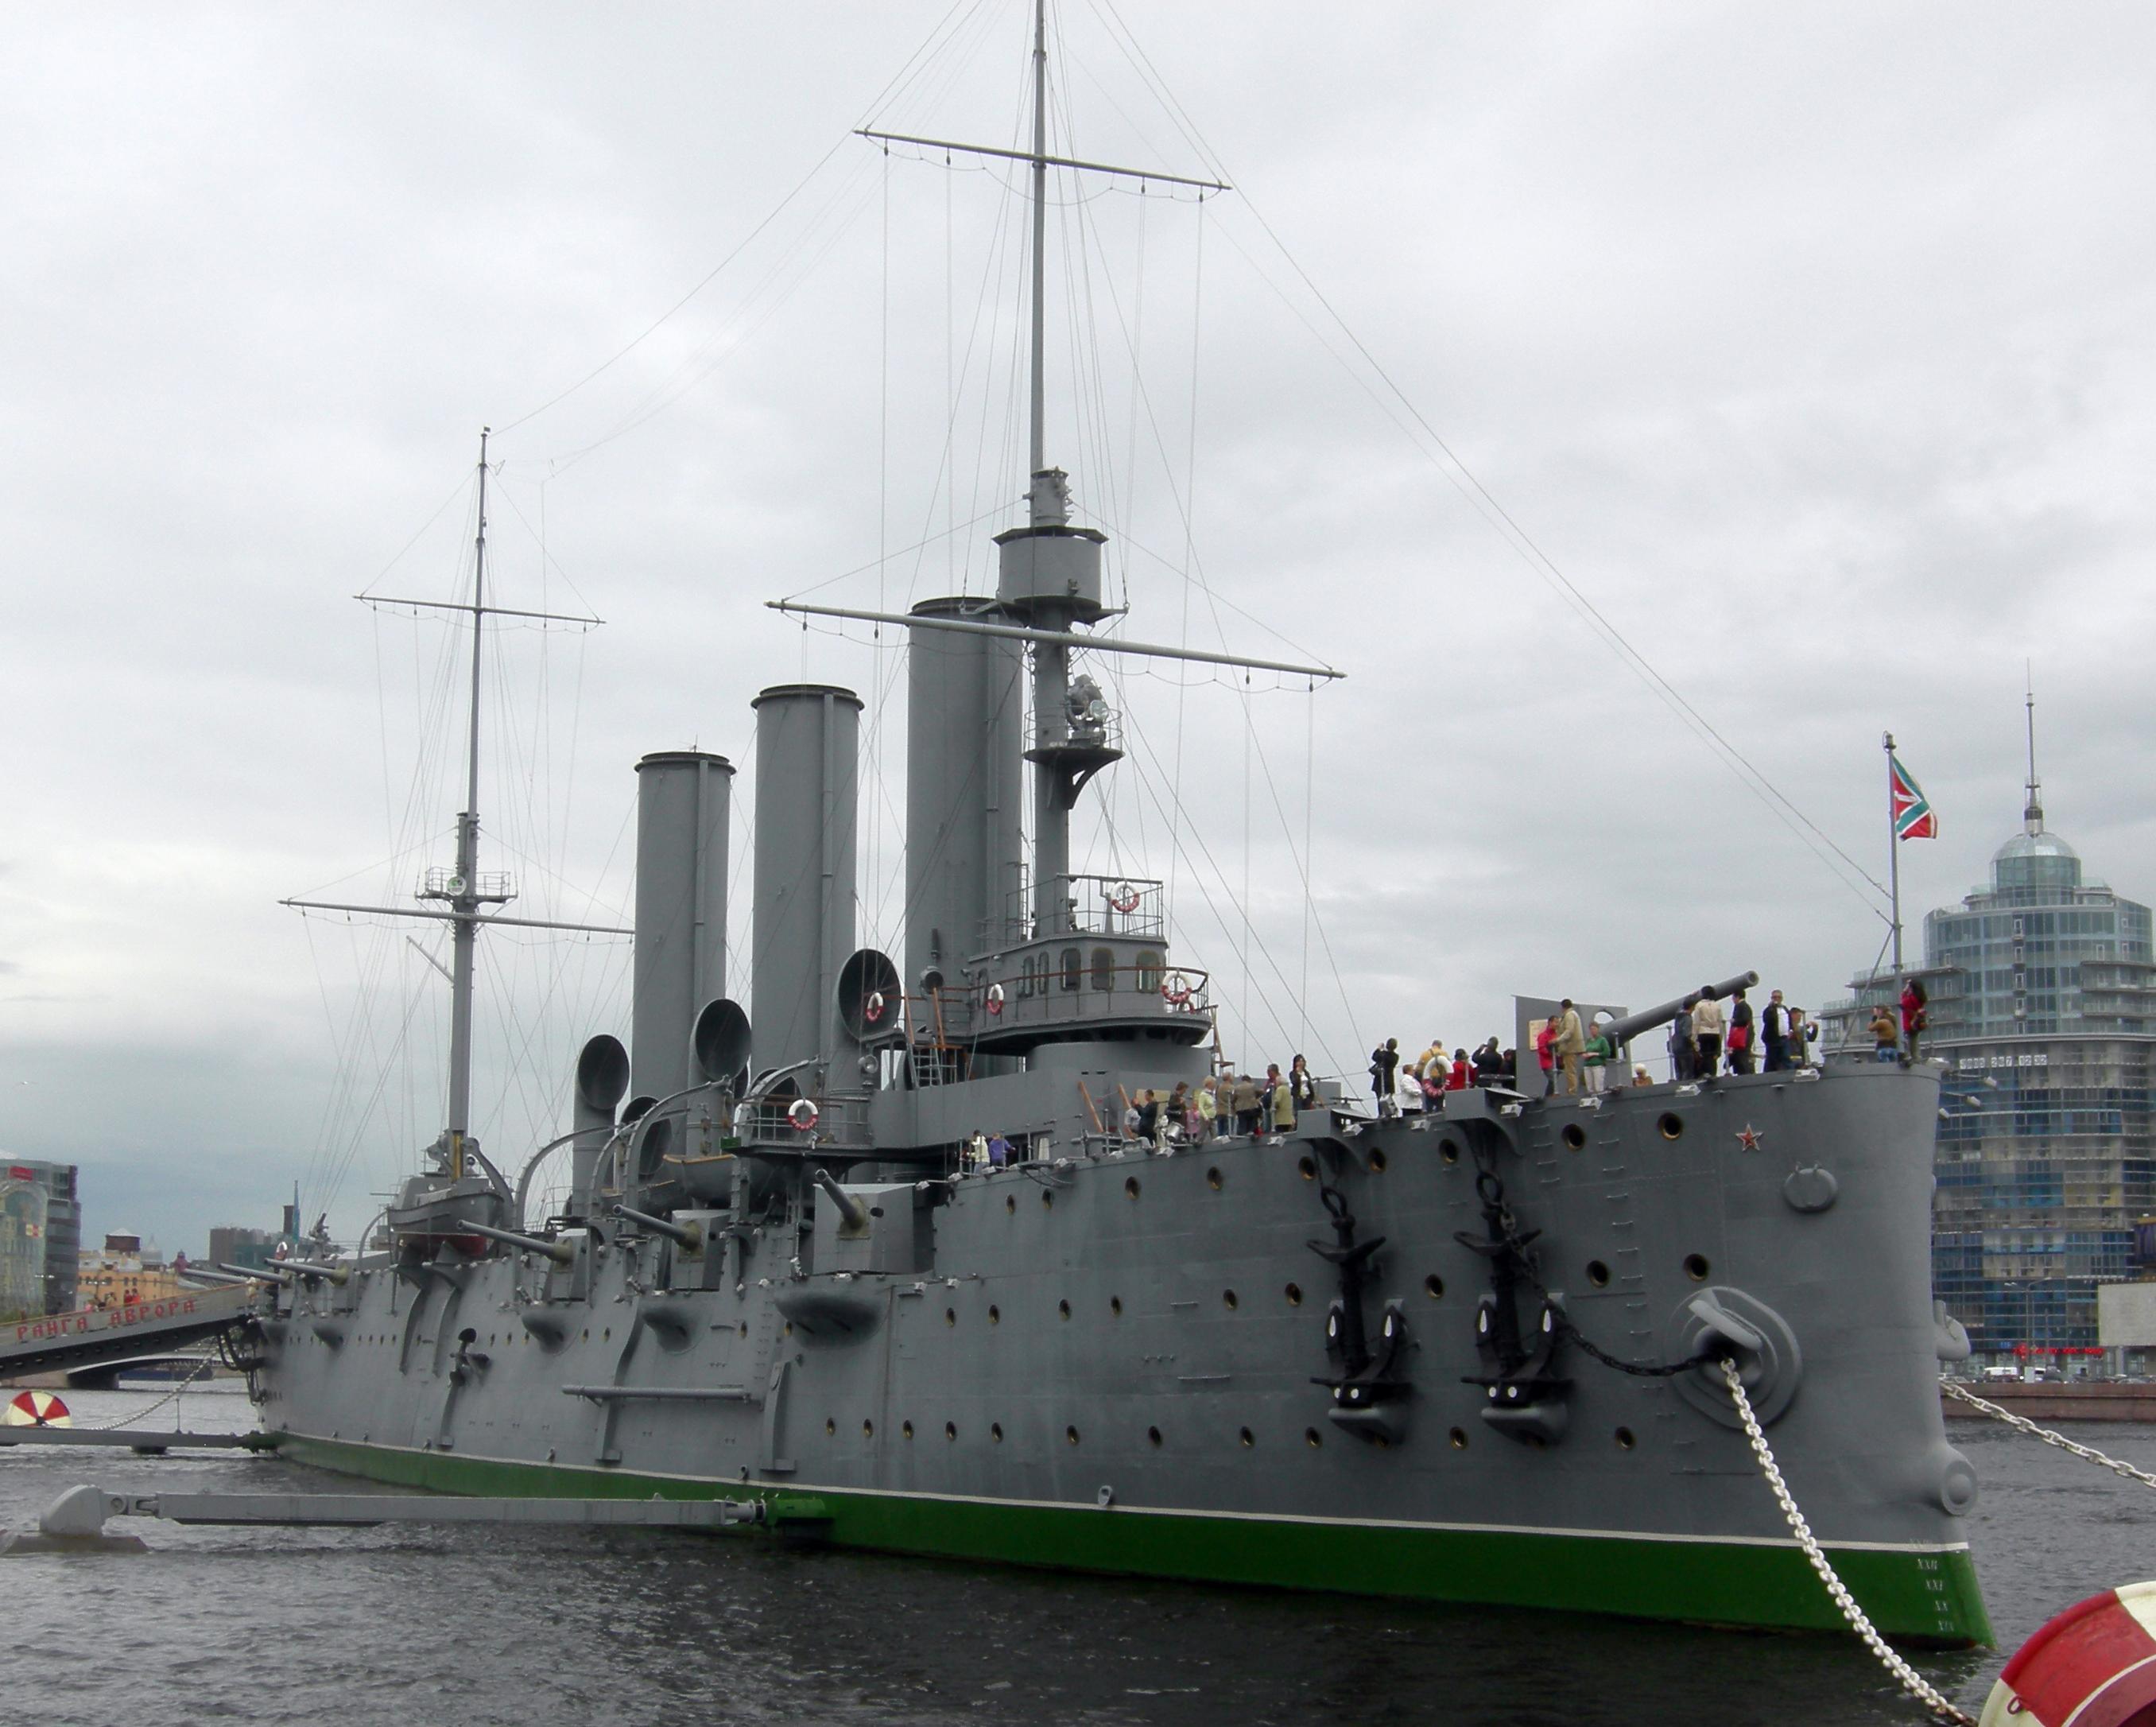 The cruiser Aurora in Saint Petersburg, Russia. Photo taken on June 16, 2009.